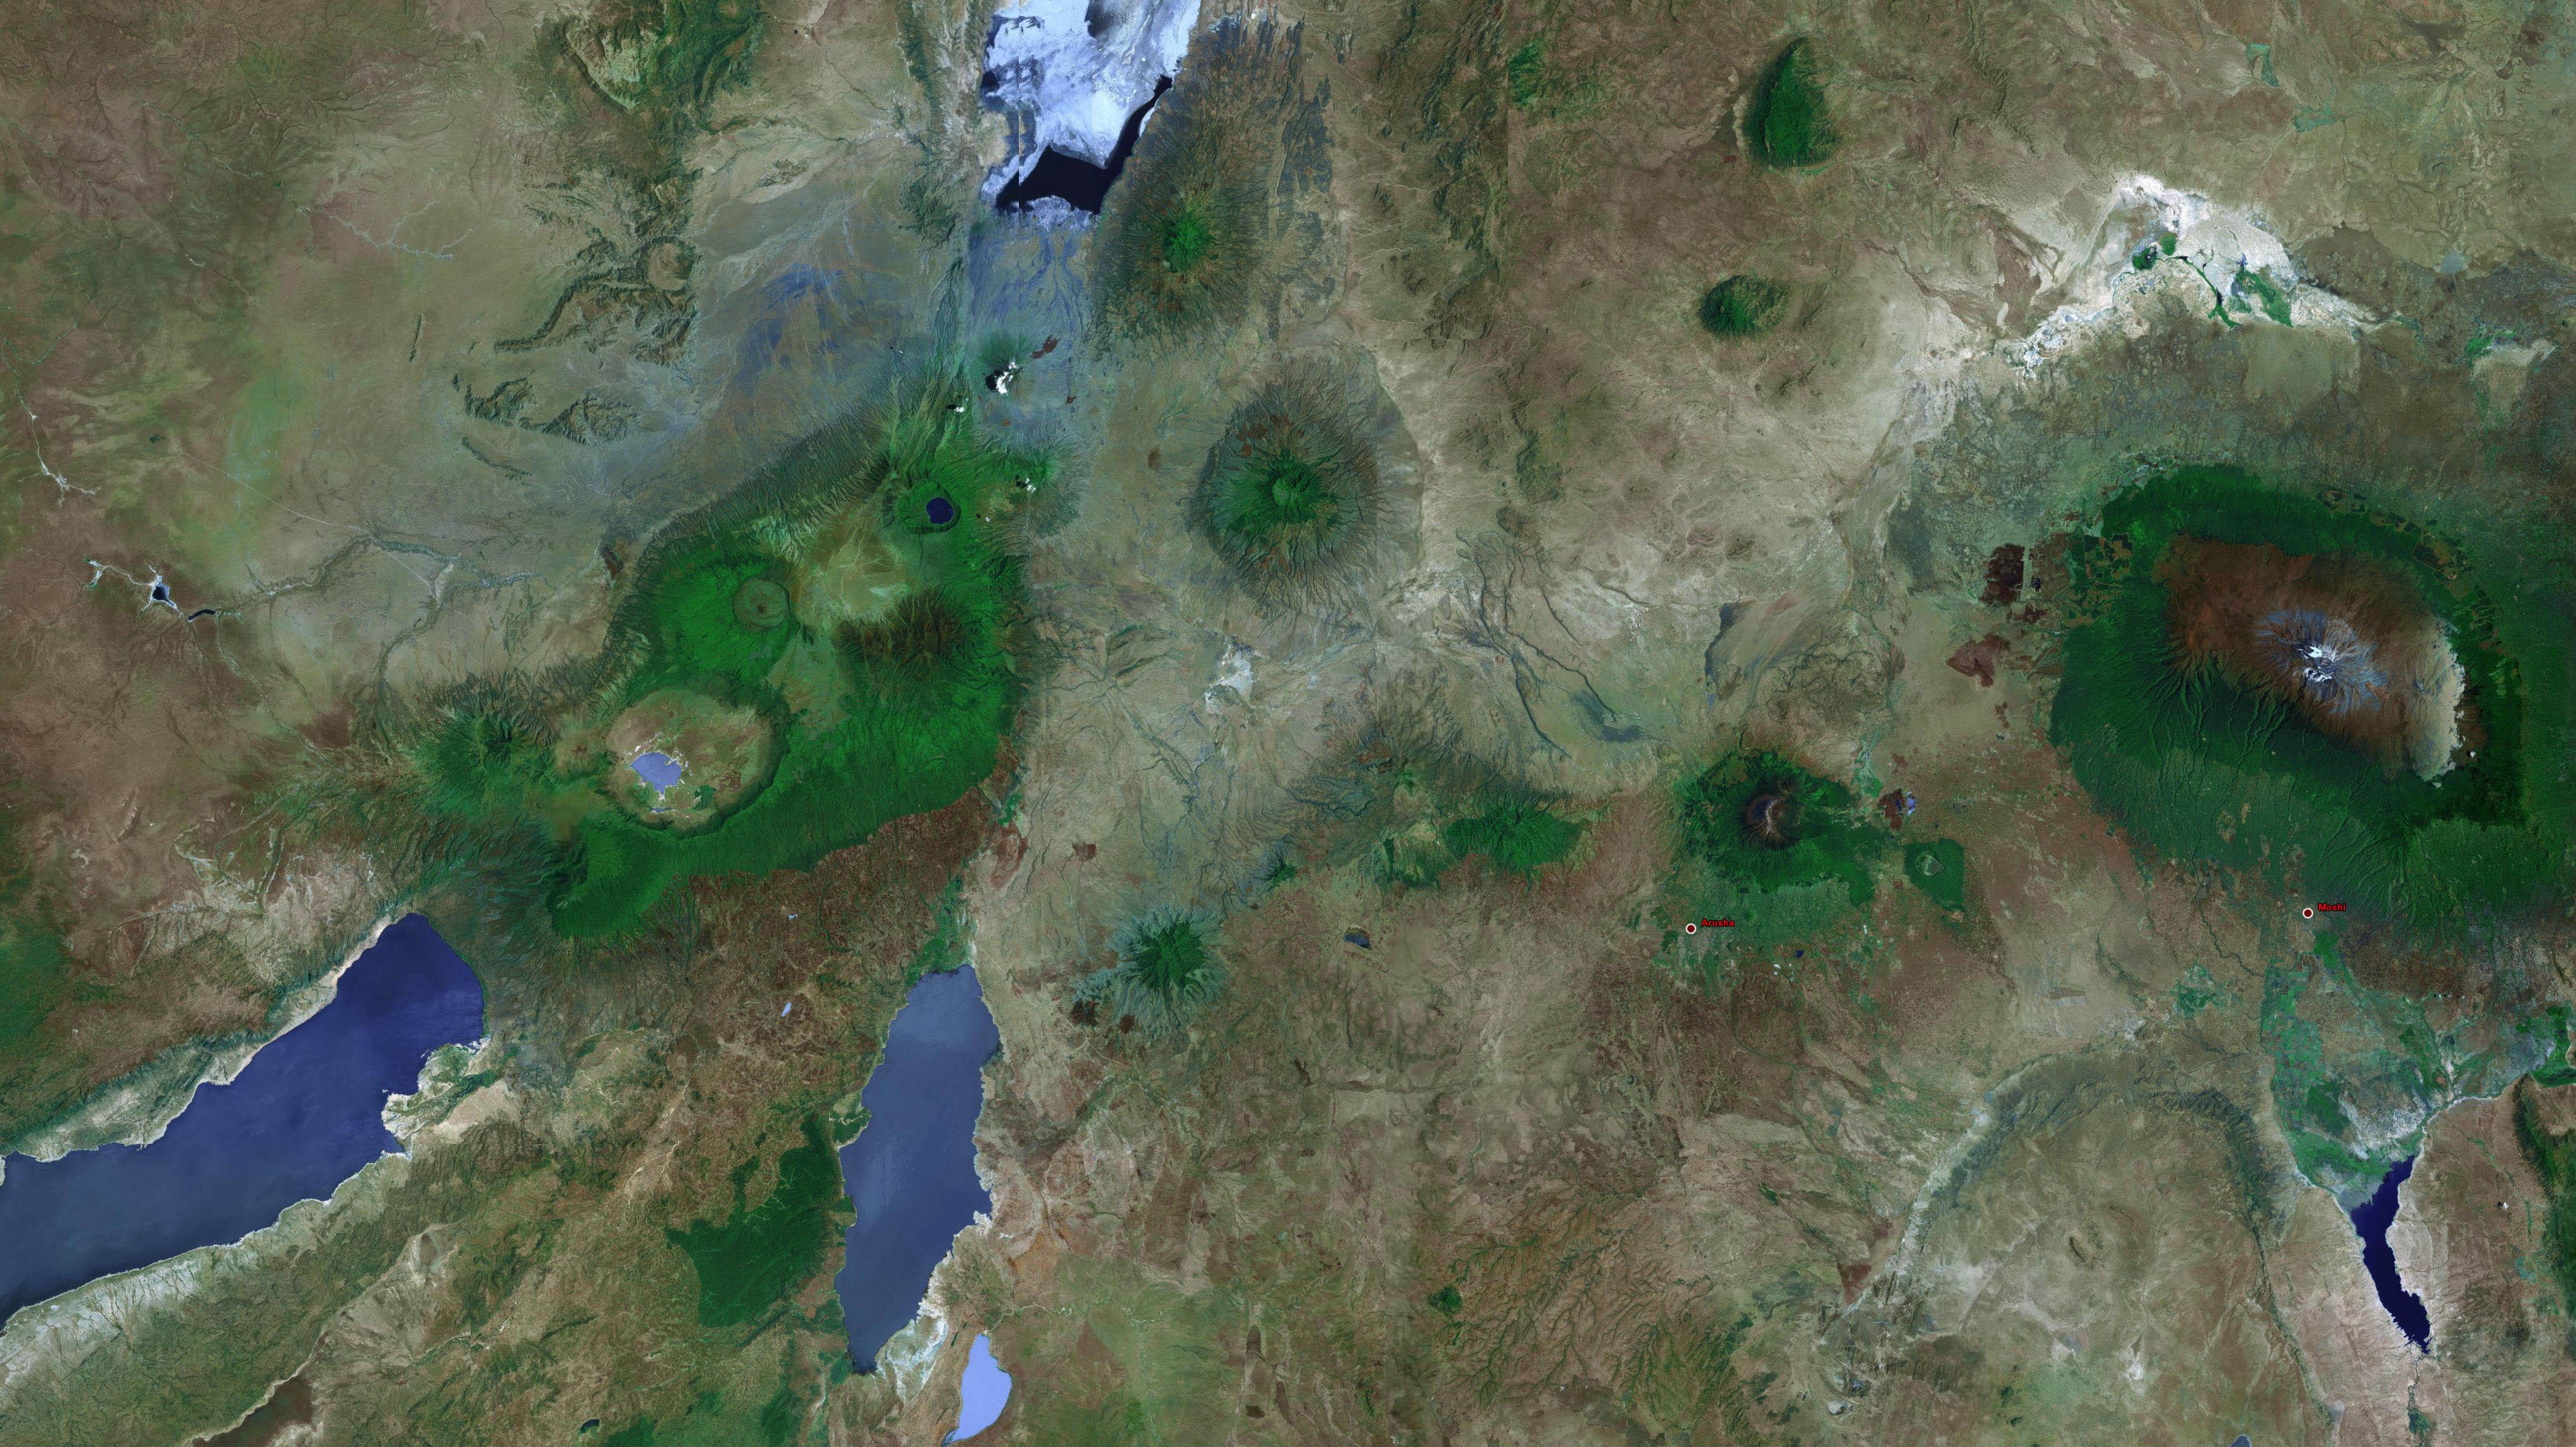 PeoplePeople Safaris - High resolution aerial maps